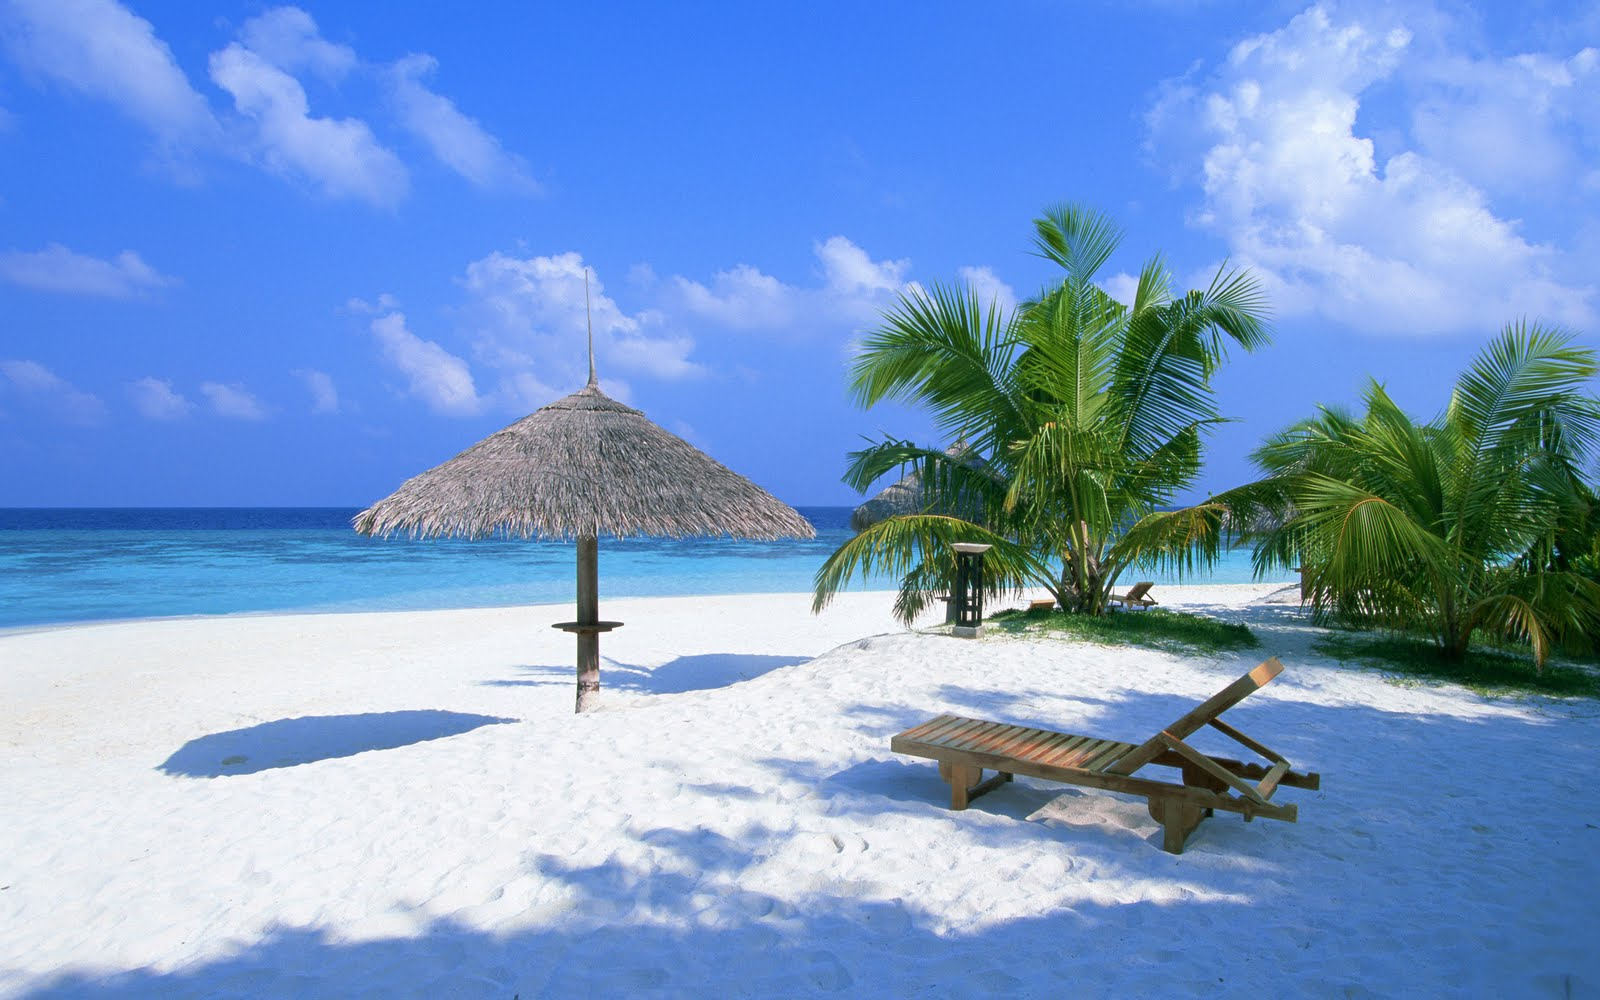 hd beach desktop backgrounds - wallpapersafari